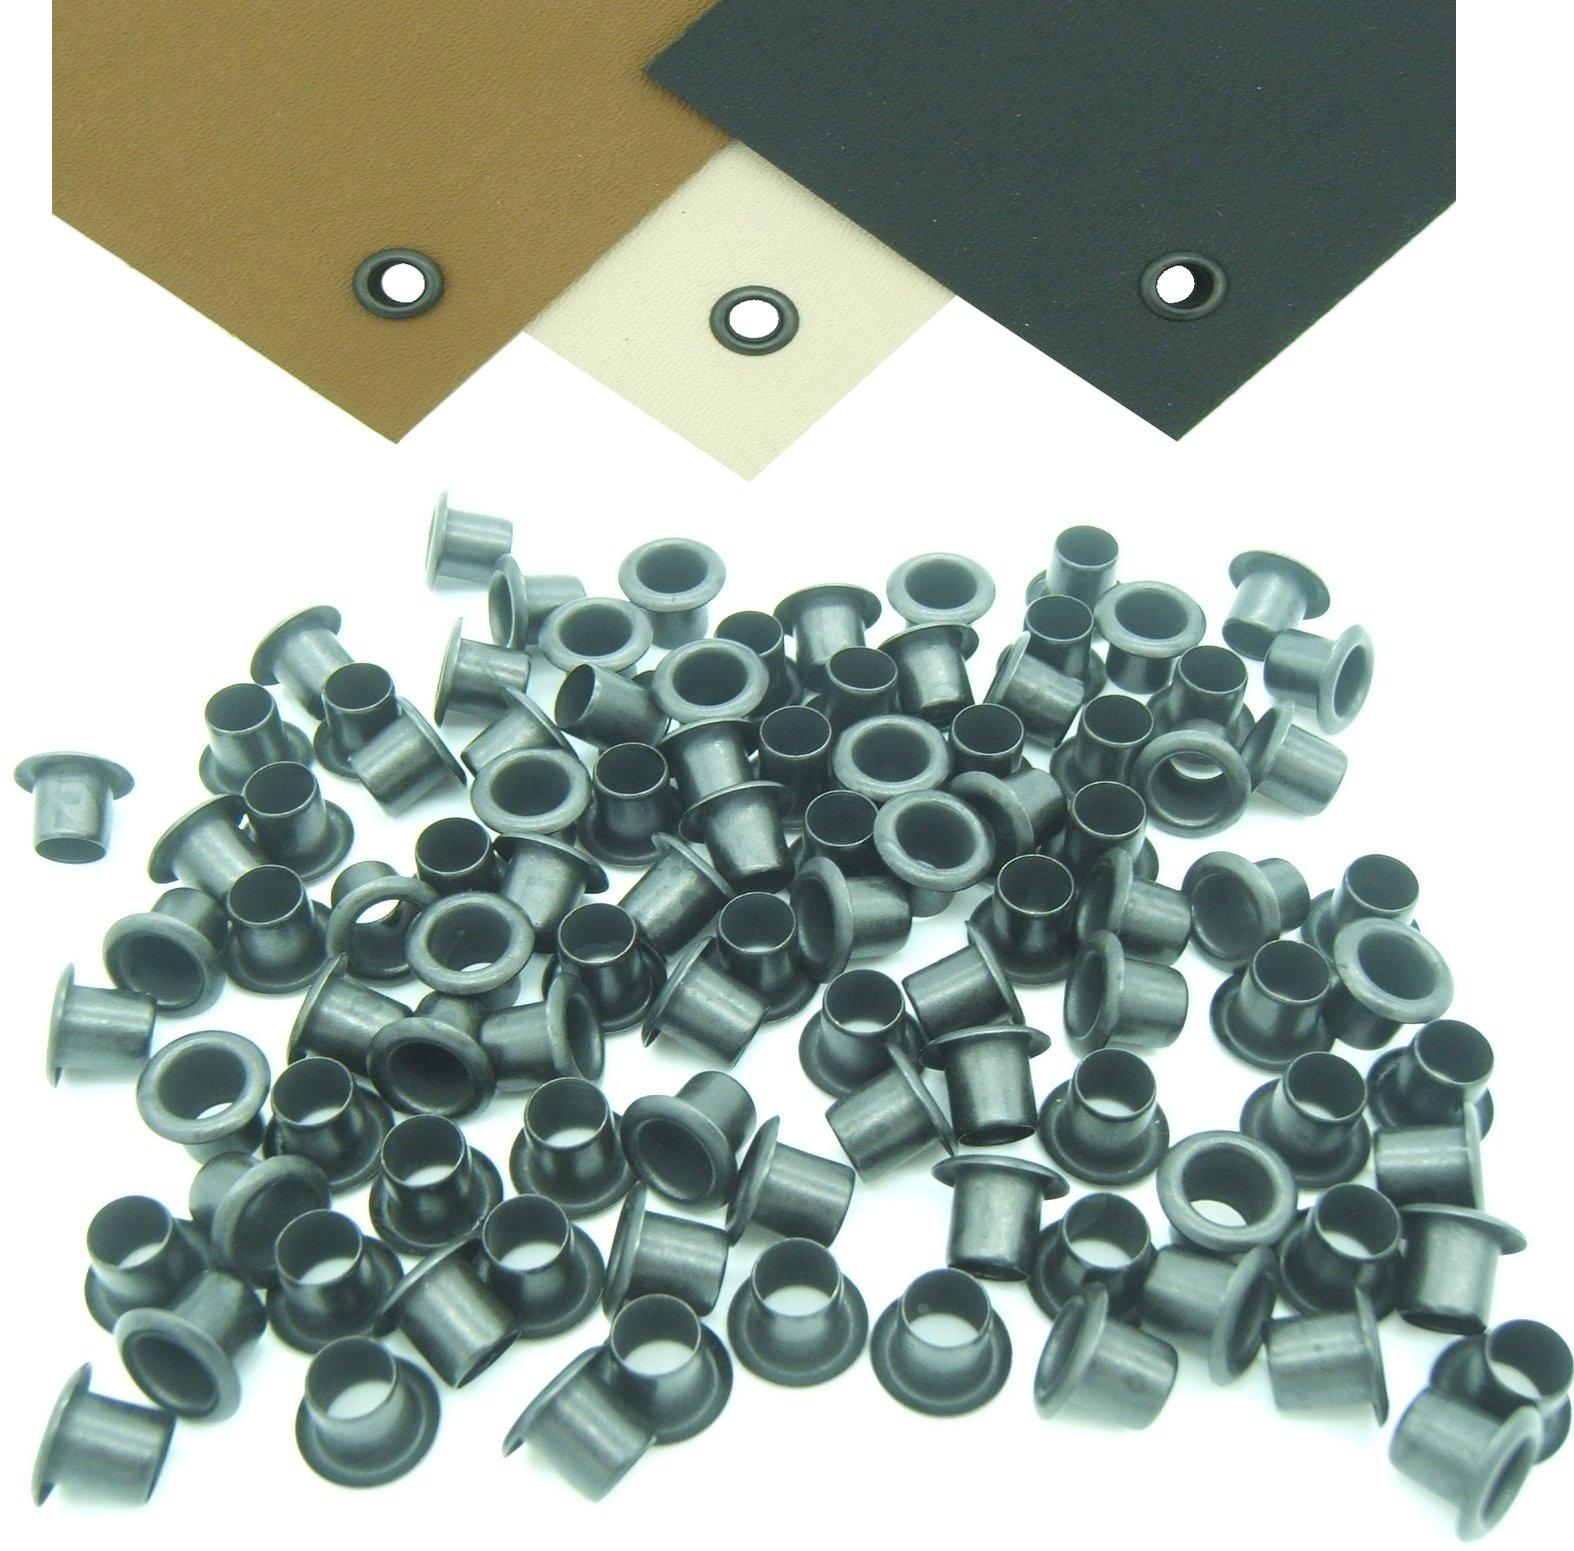 Mil-Spec Kydex Eyelets GS 8-8, Brass Black Oxide 1/4'' DIY Gun Holster Knife Sheath Grommets (100) by QuickClip Pro